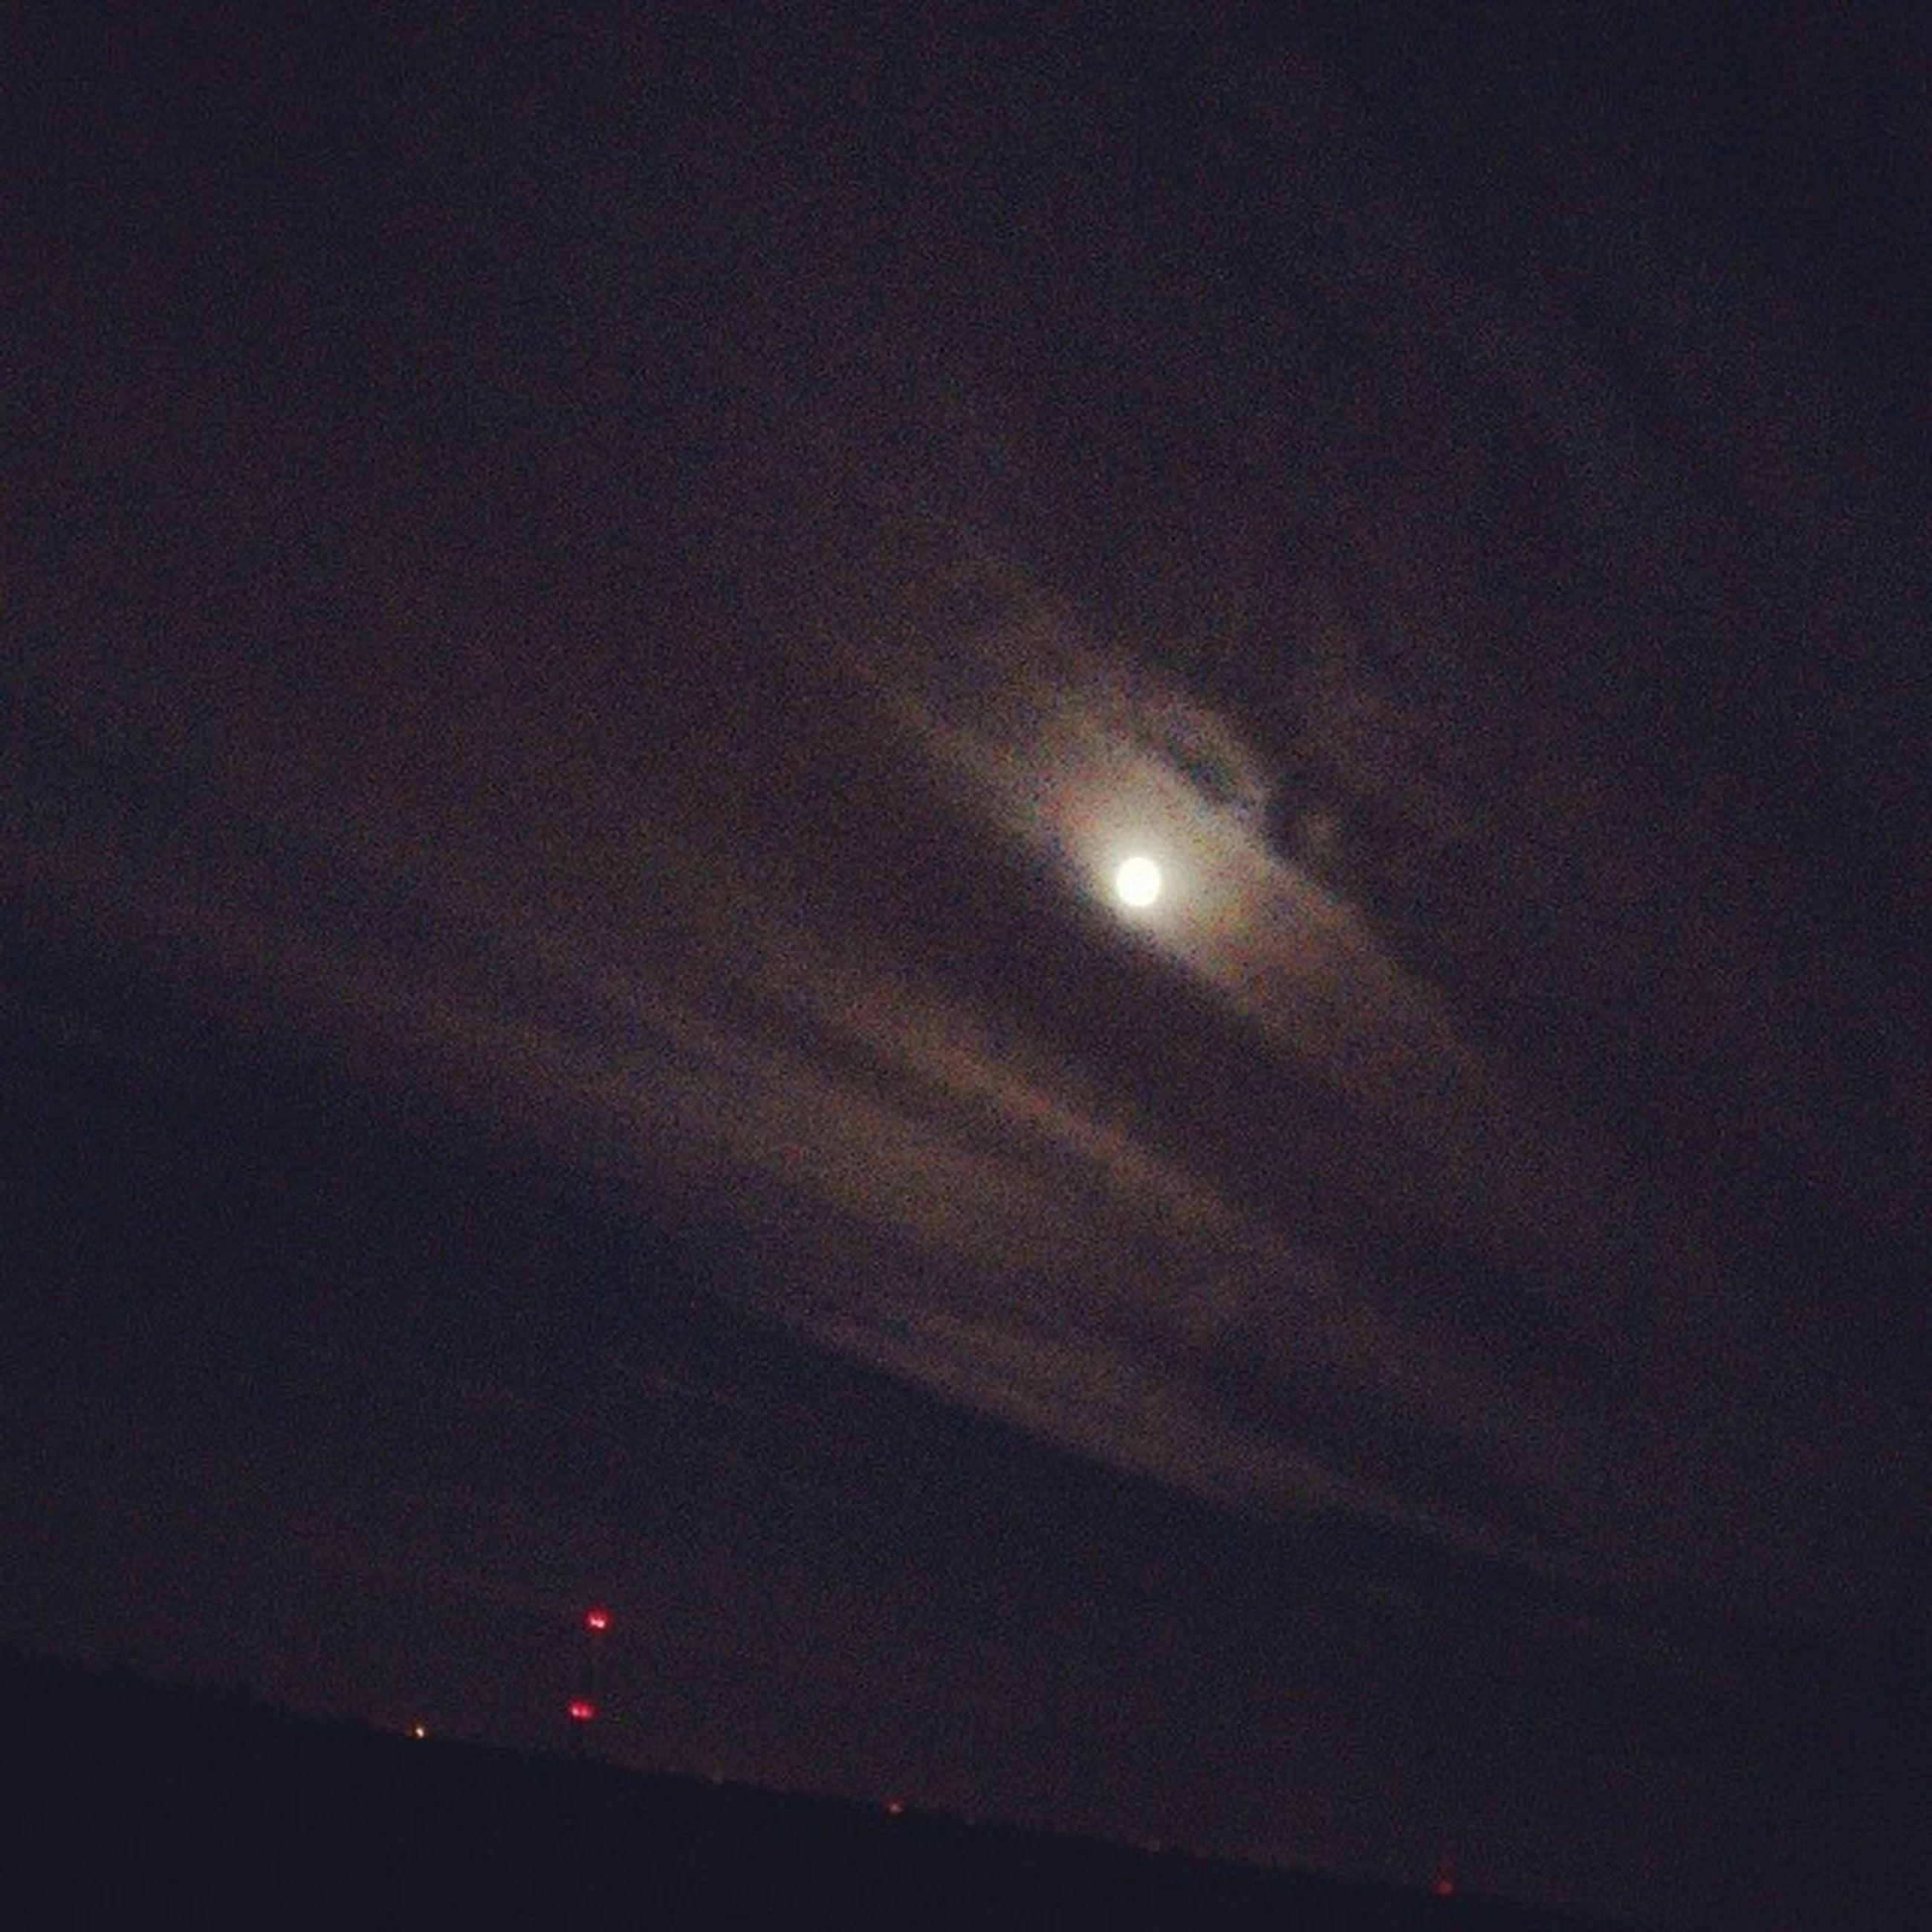 night, moon, low angle view, illuminated, sky, full moon, astronomy, dark, scenics, beauty in nature, nature, lighting equipment, tranquility, street light, copy space, moonlight, outdoors, no people, dusk, light - natural phenomenon